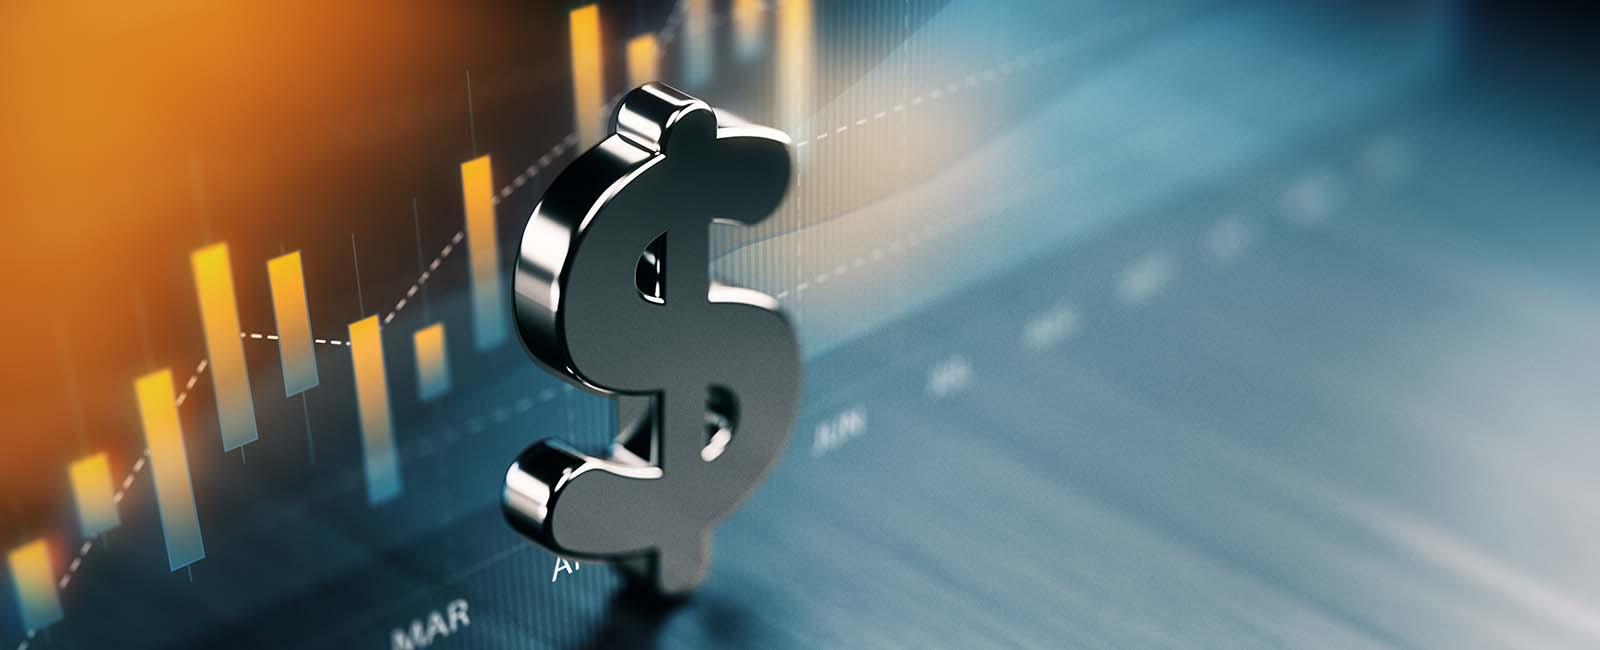 Cara Menghitung Pendapatan Per Kapita Suatu Negara